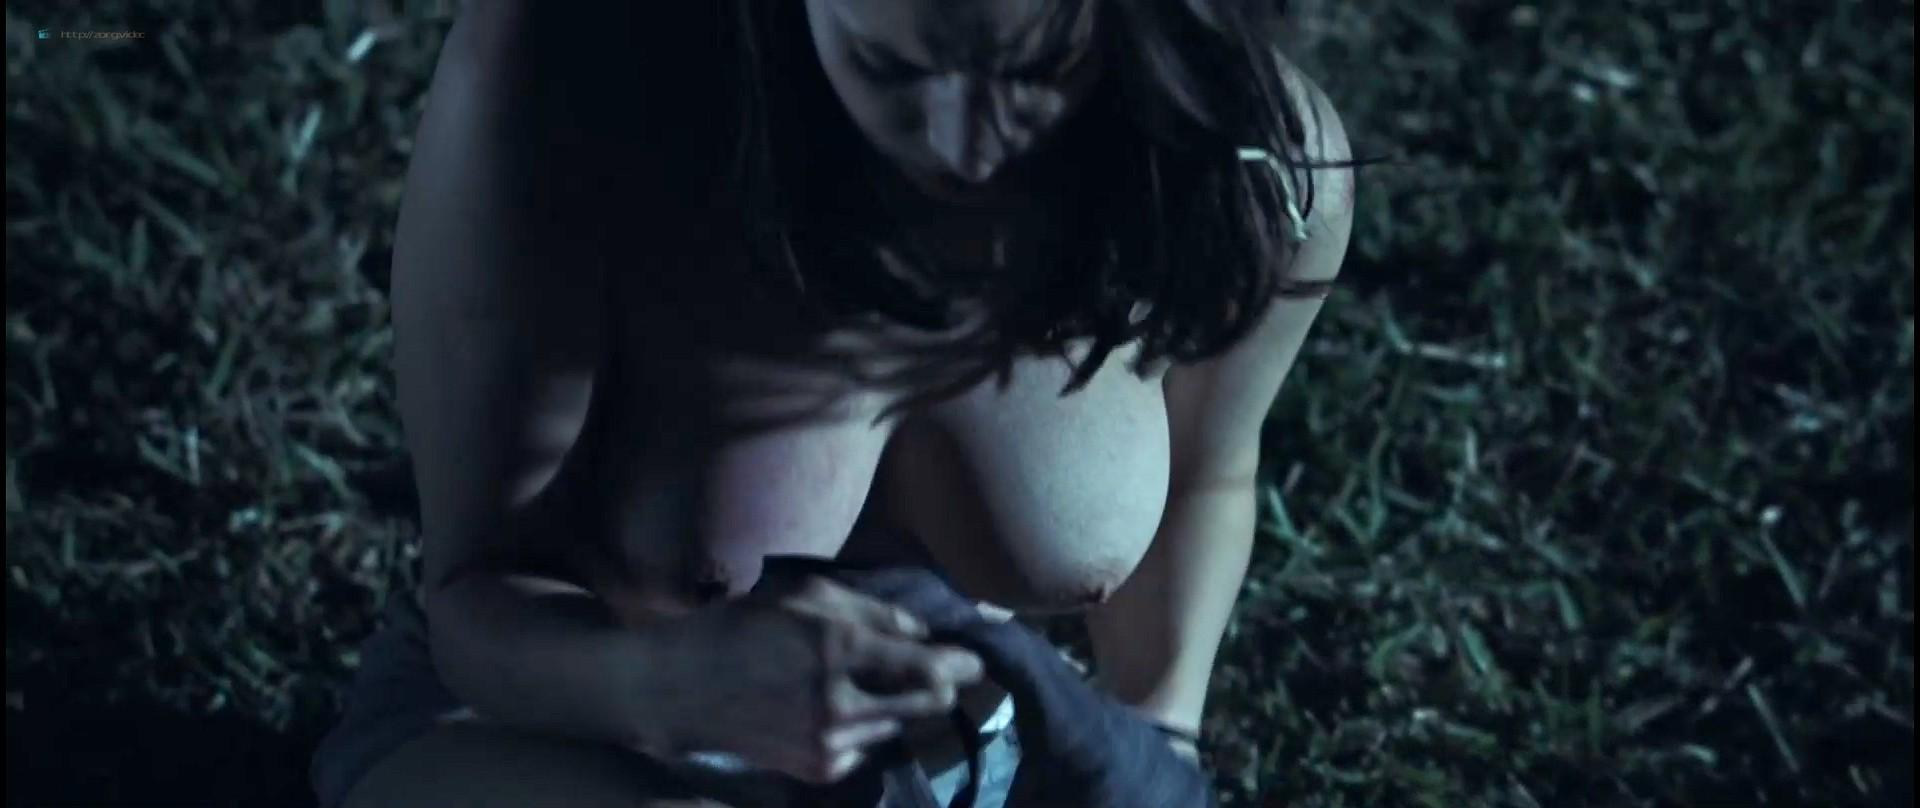 Jemma Dallender nude Rachel Rosenstein nude butt - The Executioners (2018) HD 1080p (4)